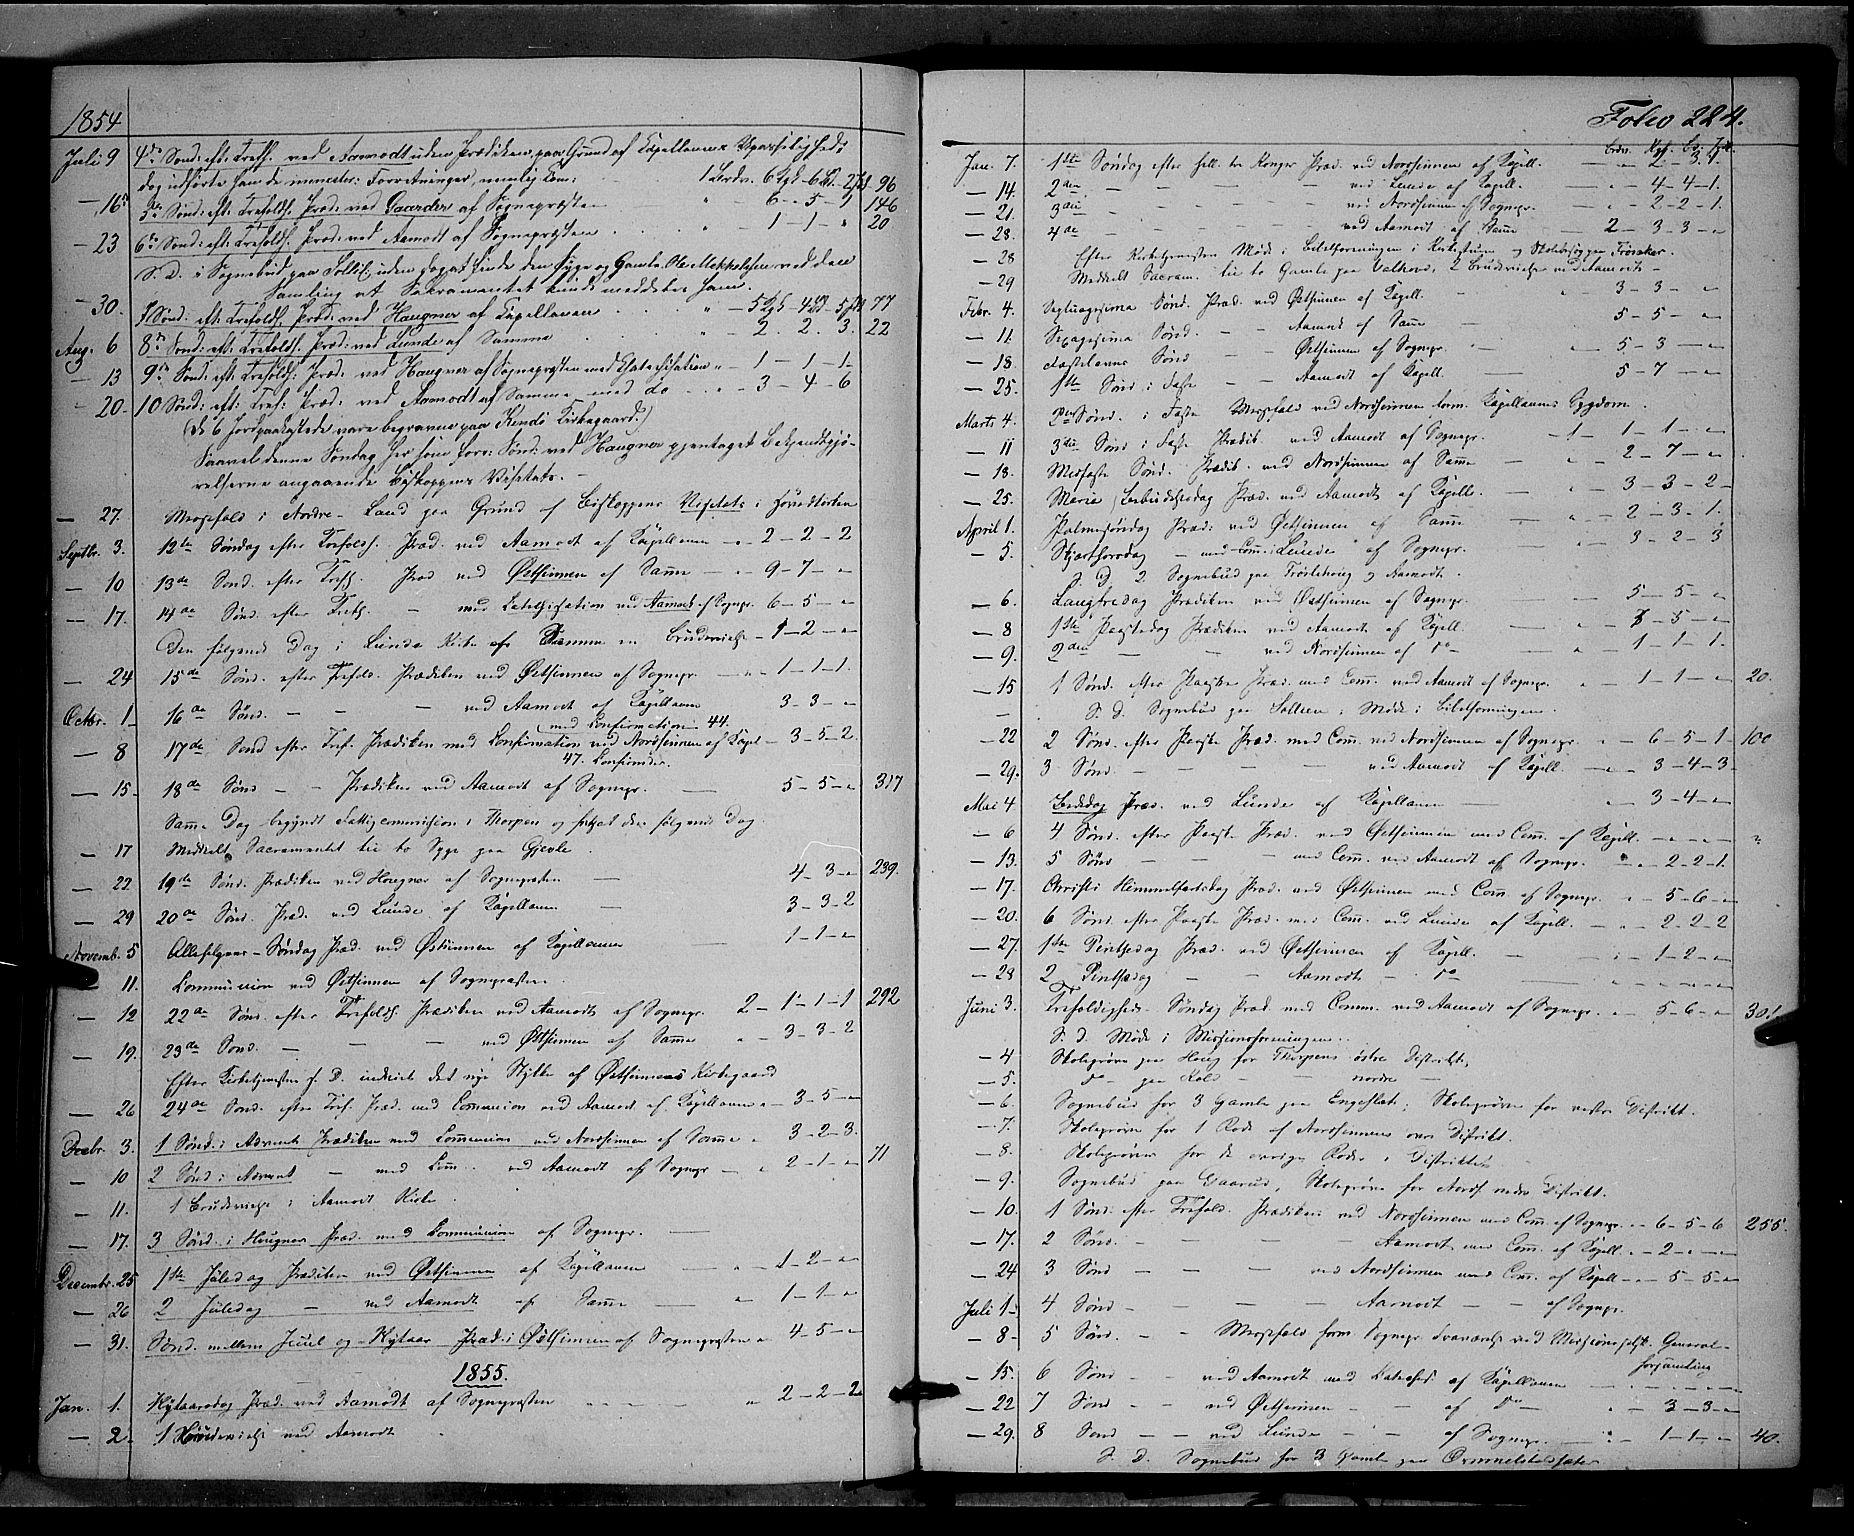 SAH, Land prestekontor, Ministerialbok nr. 10, 1847-1859, s. 224